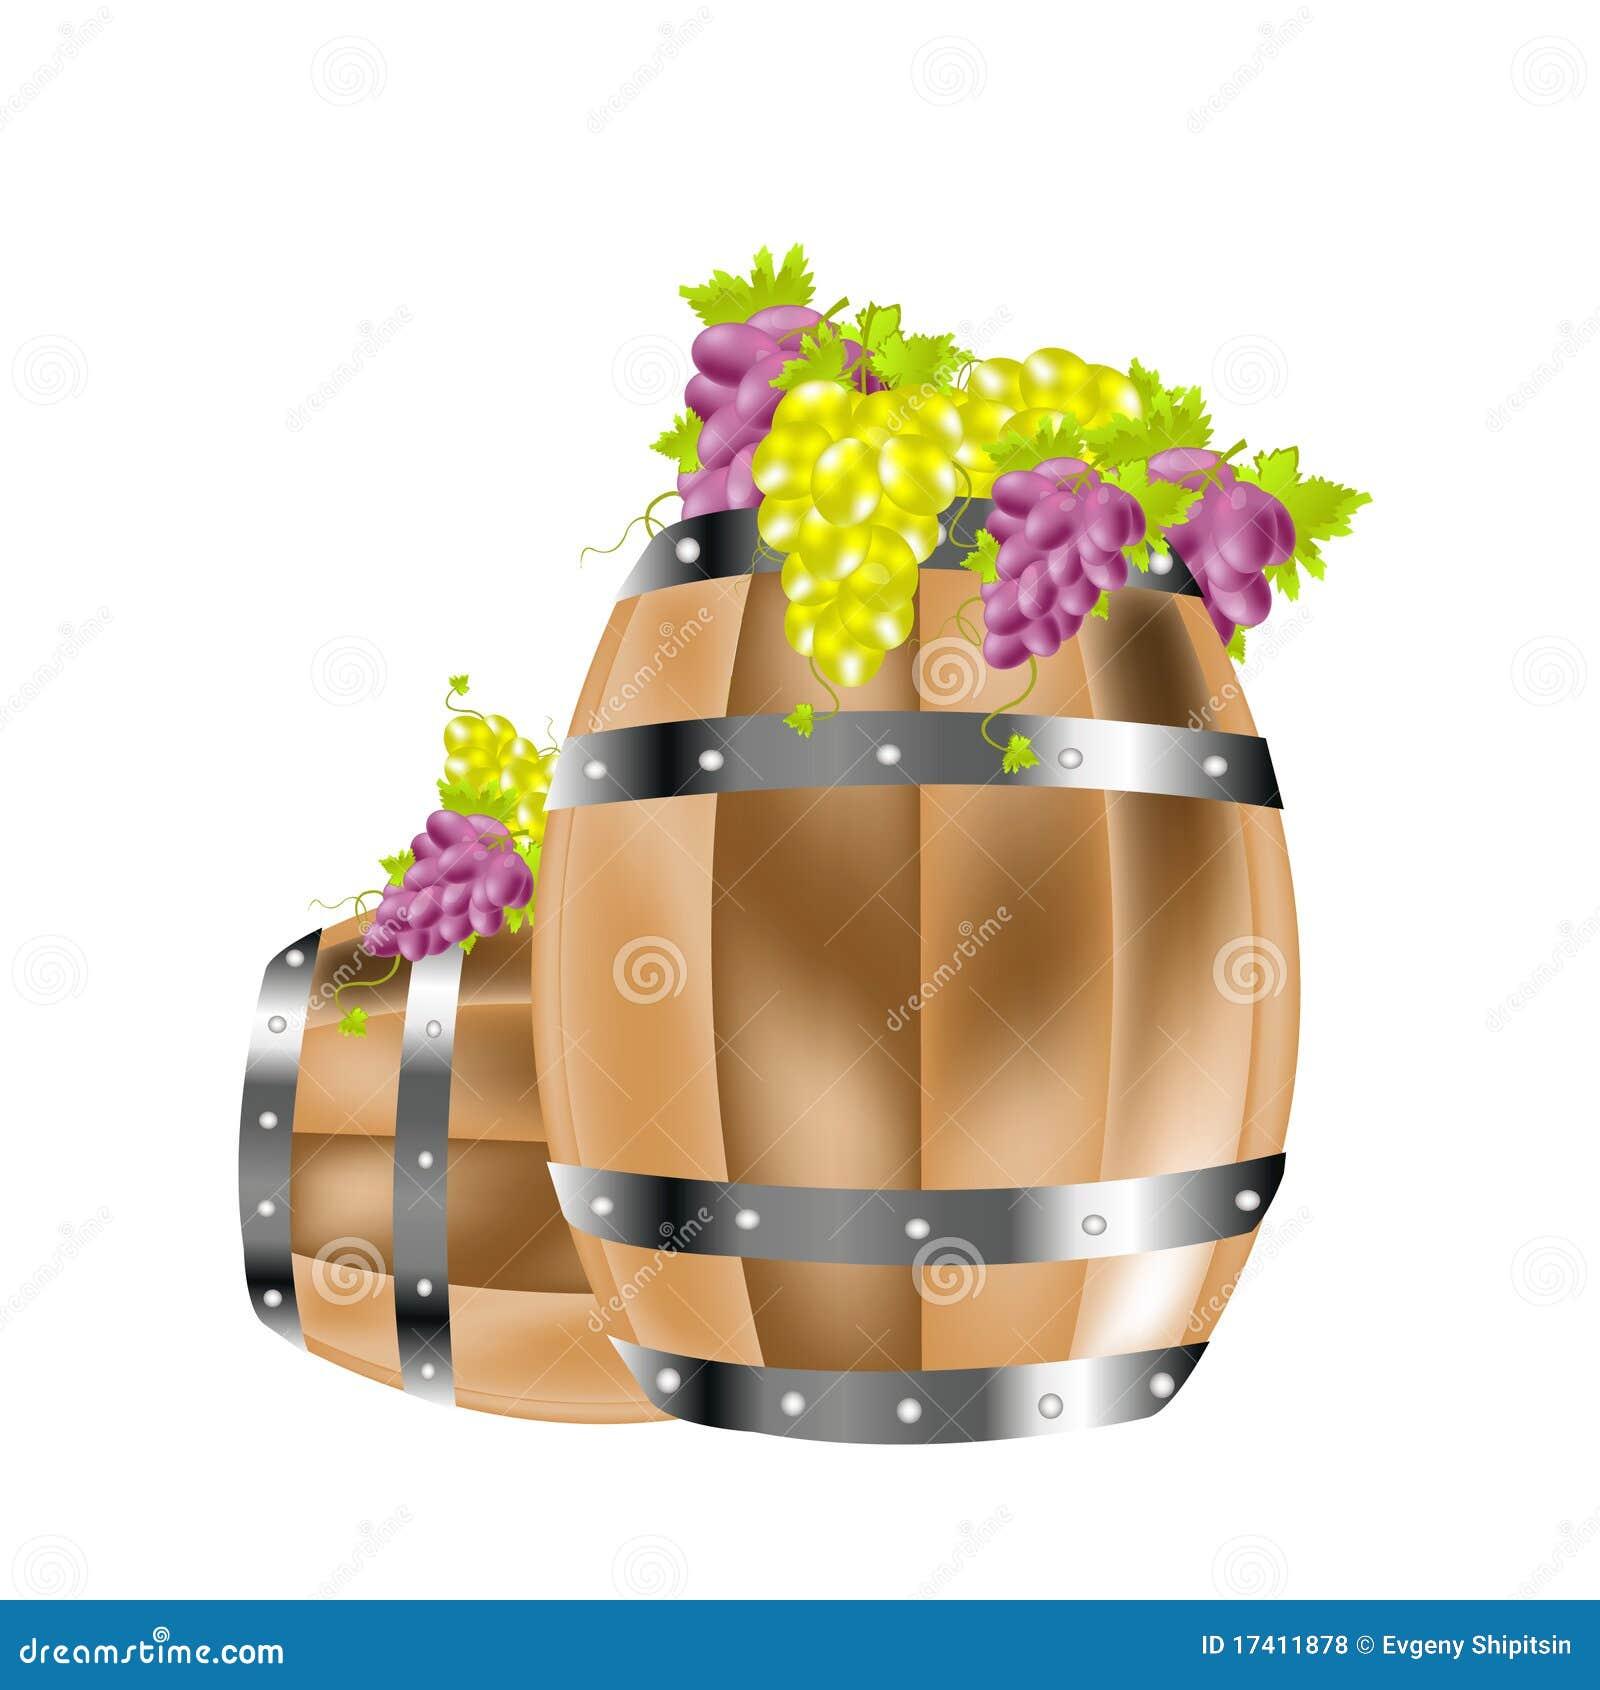 Barriles y uva de madera for Barriles de madera bar